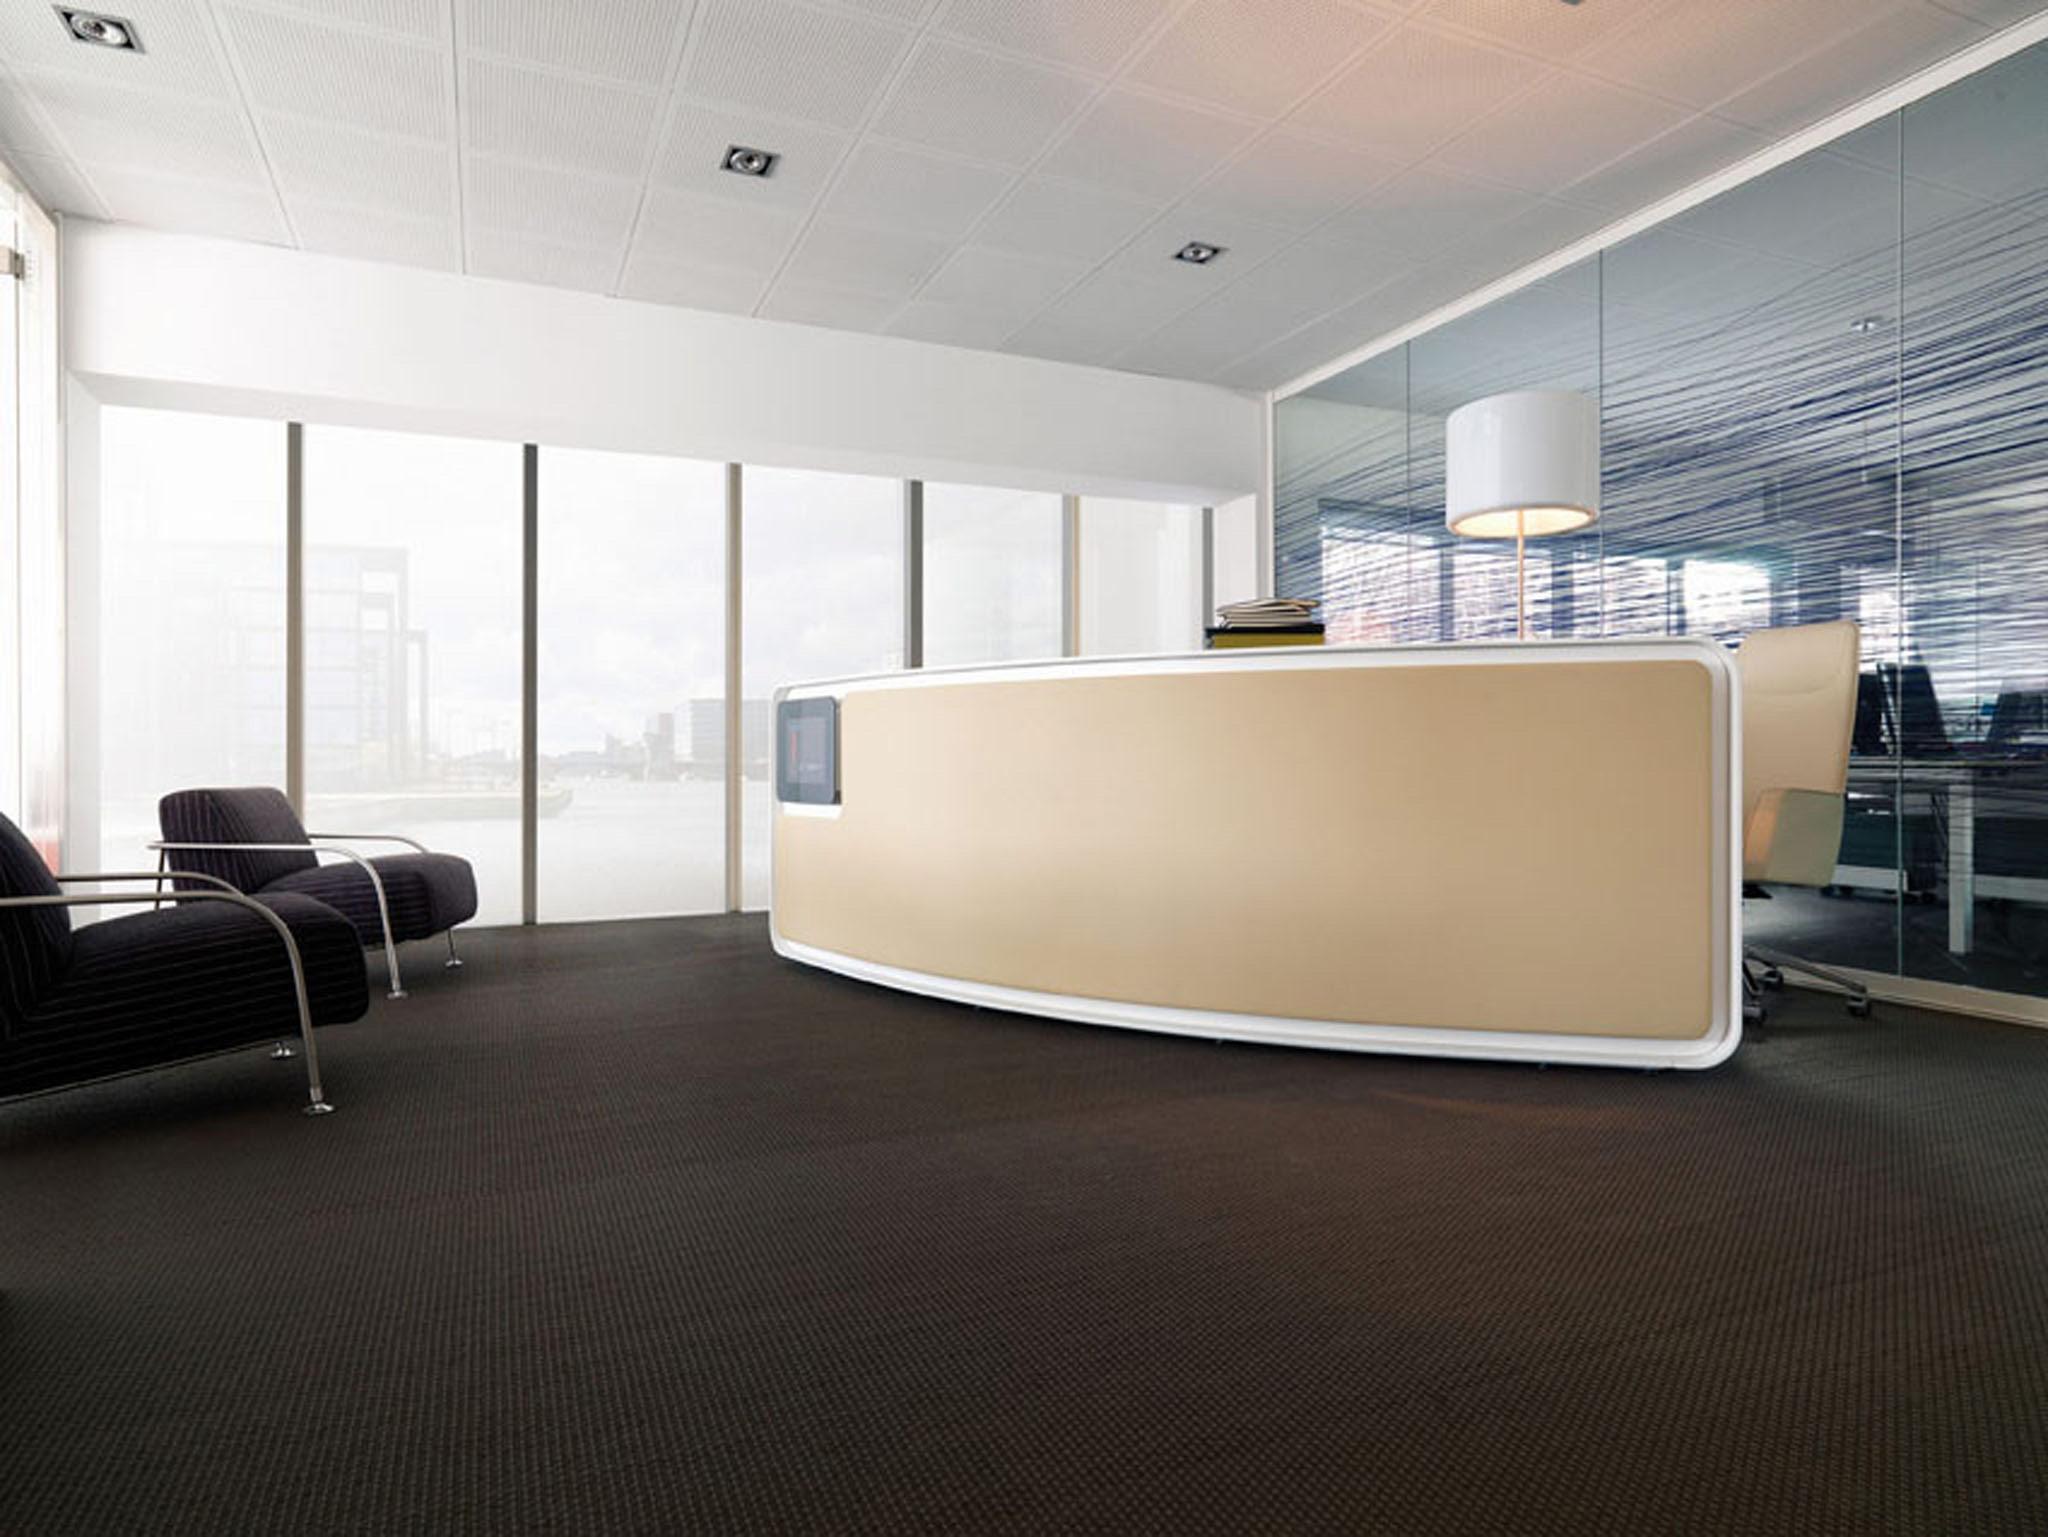 Vega toscana reception da ufficio belardi arredamenti for Mobili per reception